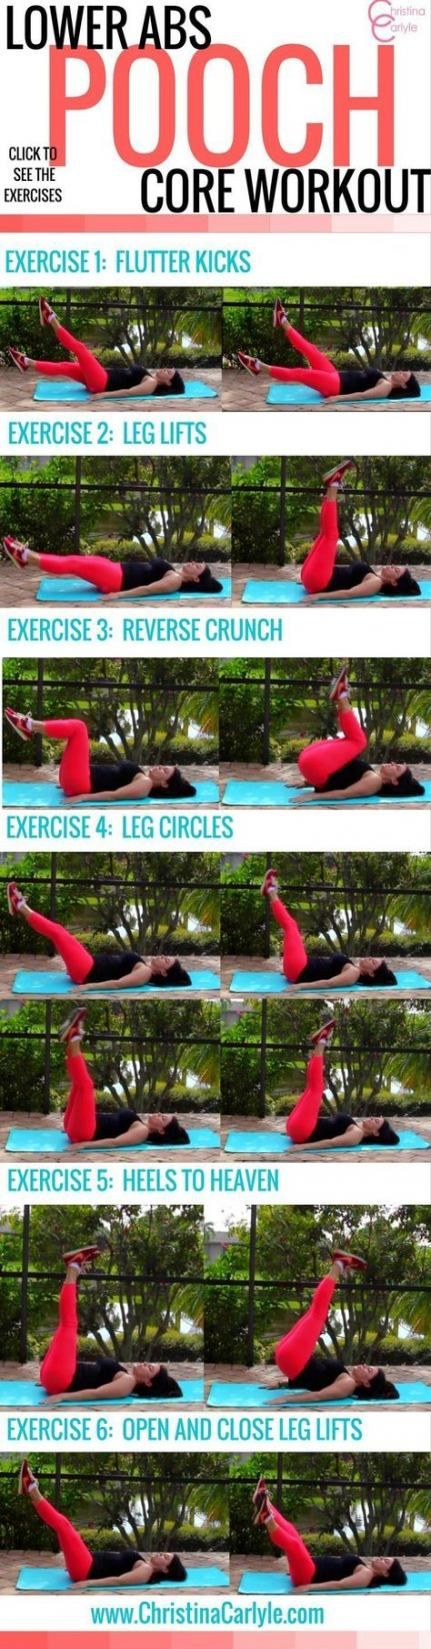 Fitness goals ideas tips 53+ ideas #fitness